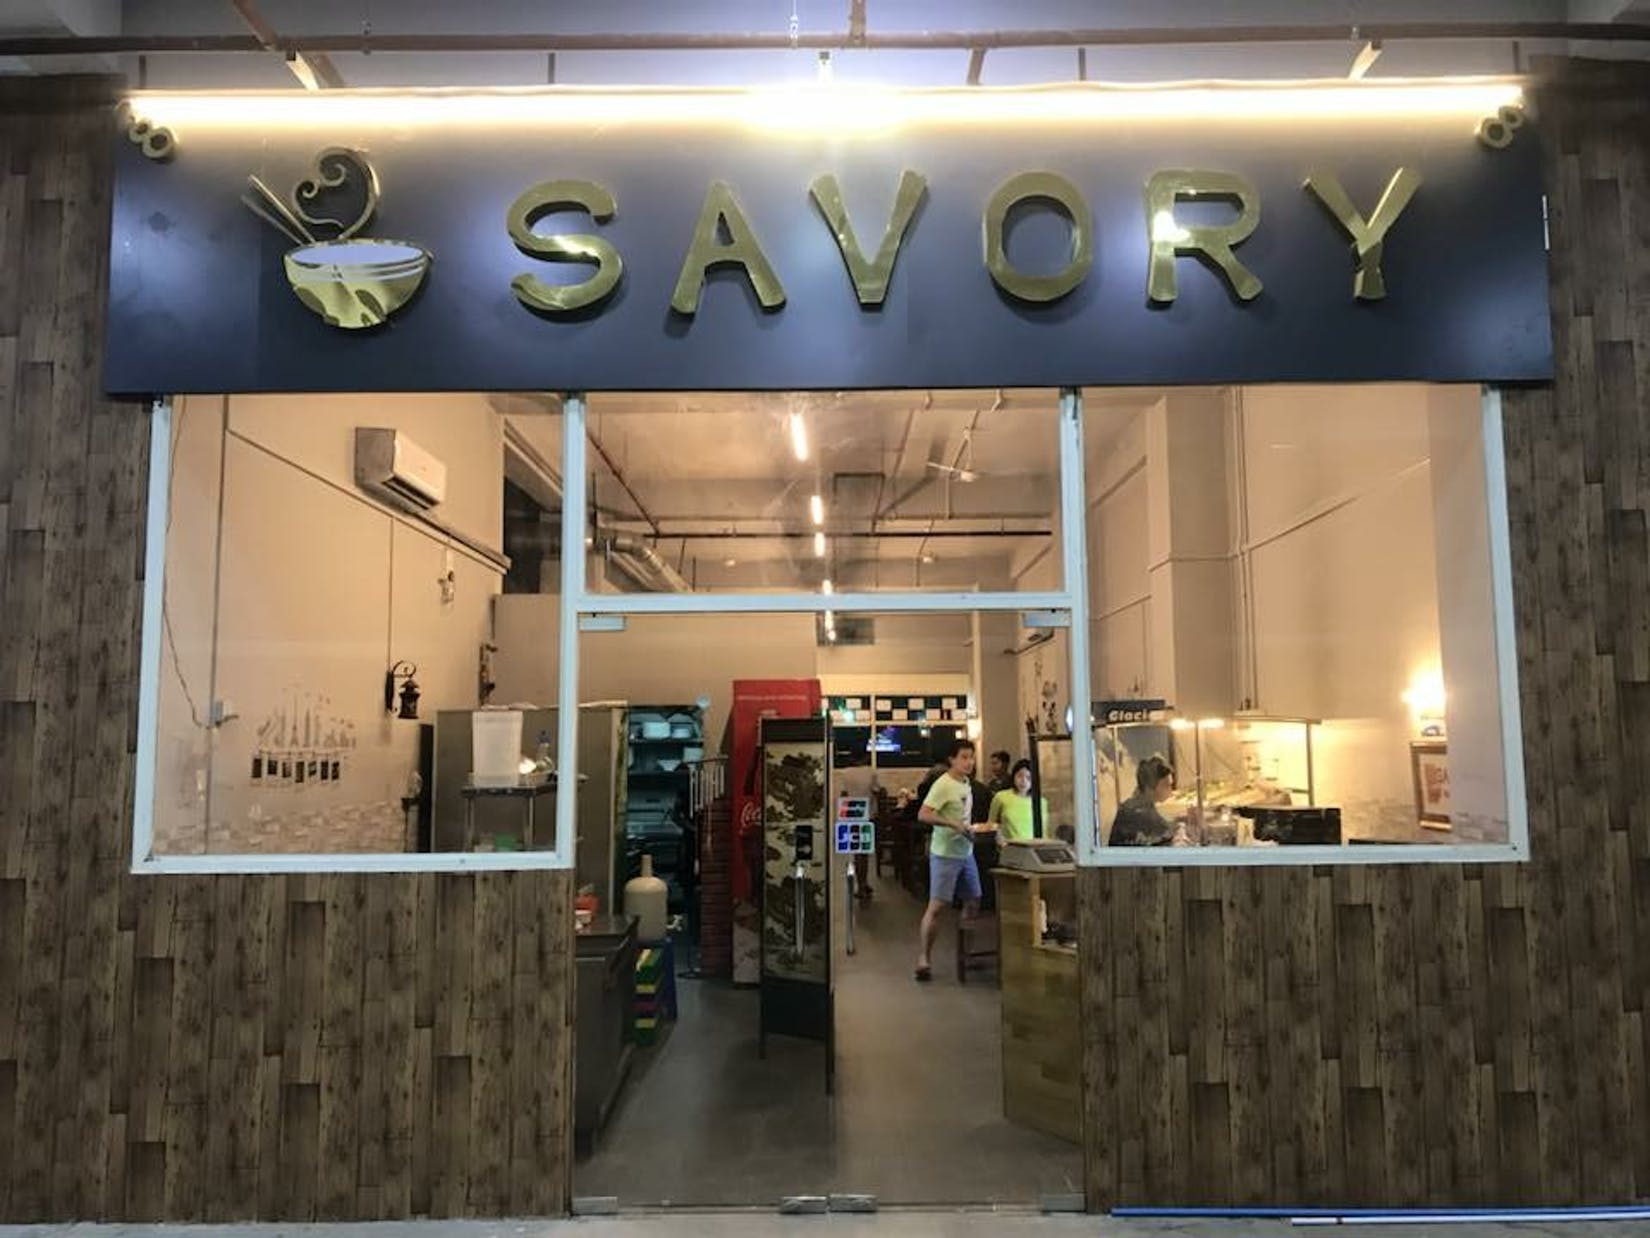 Savory Ma La Xiang Gou & Thai Food | yathar